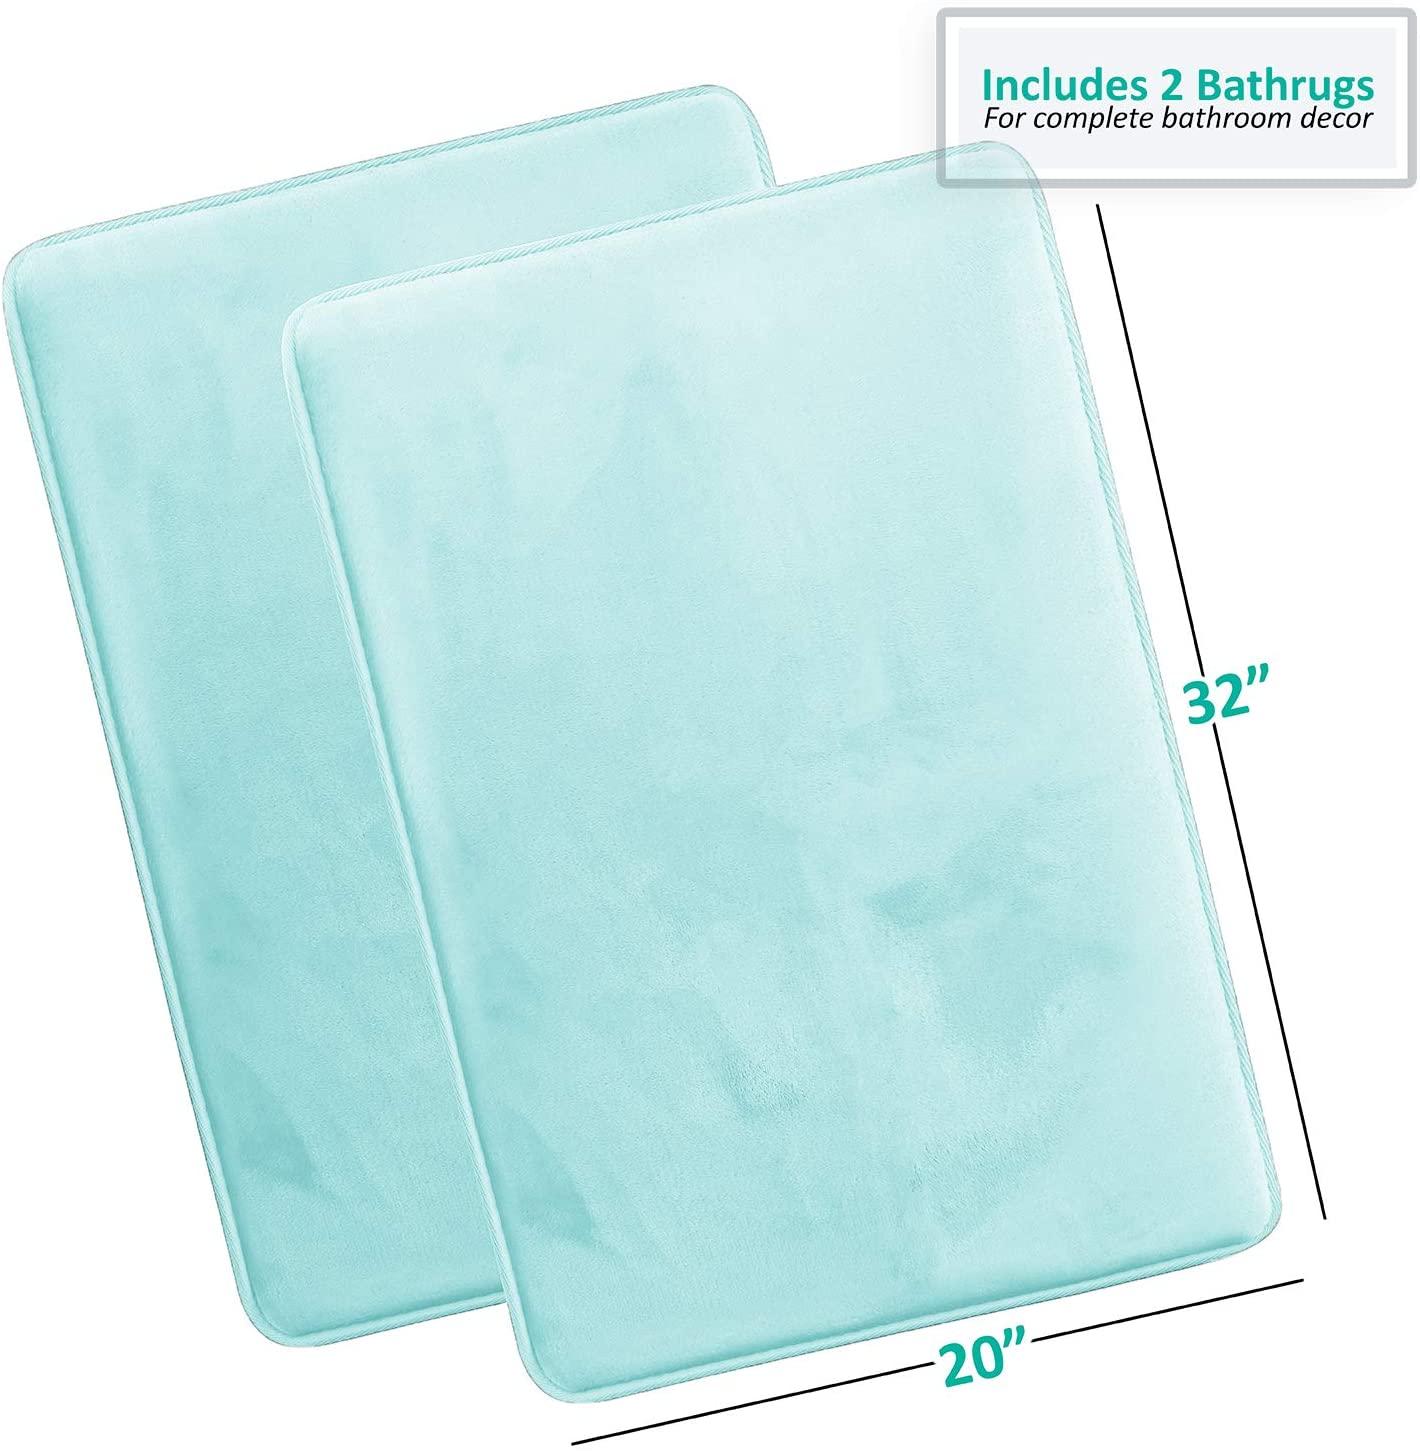 Memory Foam Bathrug 2 Pack Set – Aqua - Bath Mat and Shower Rug Large 20